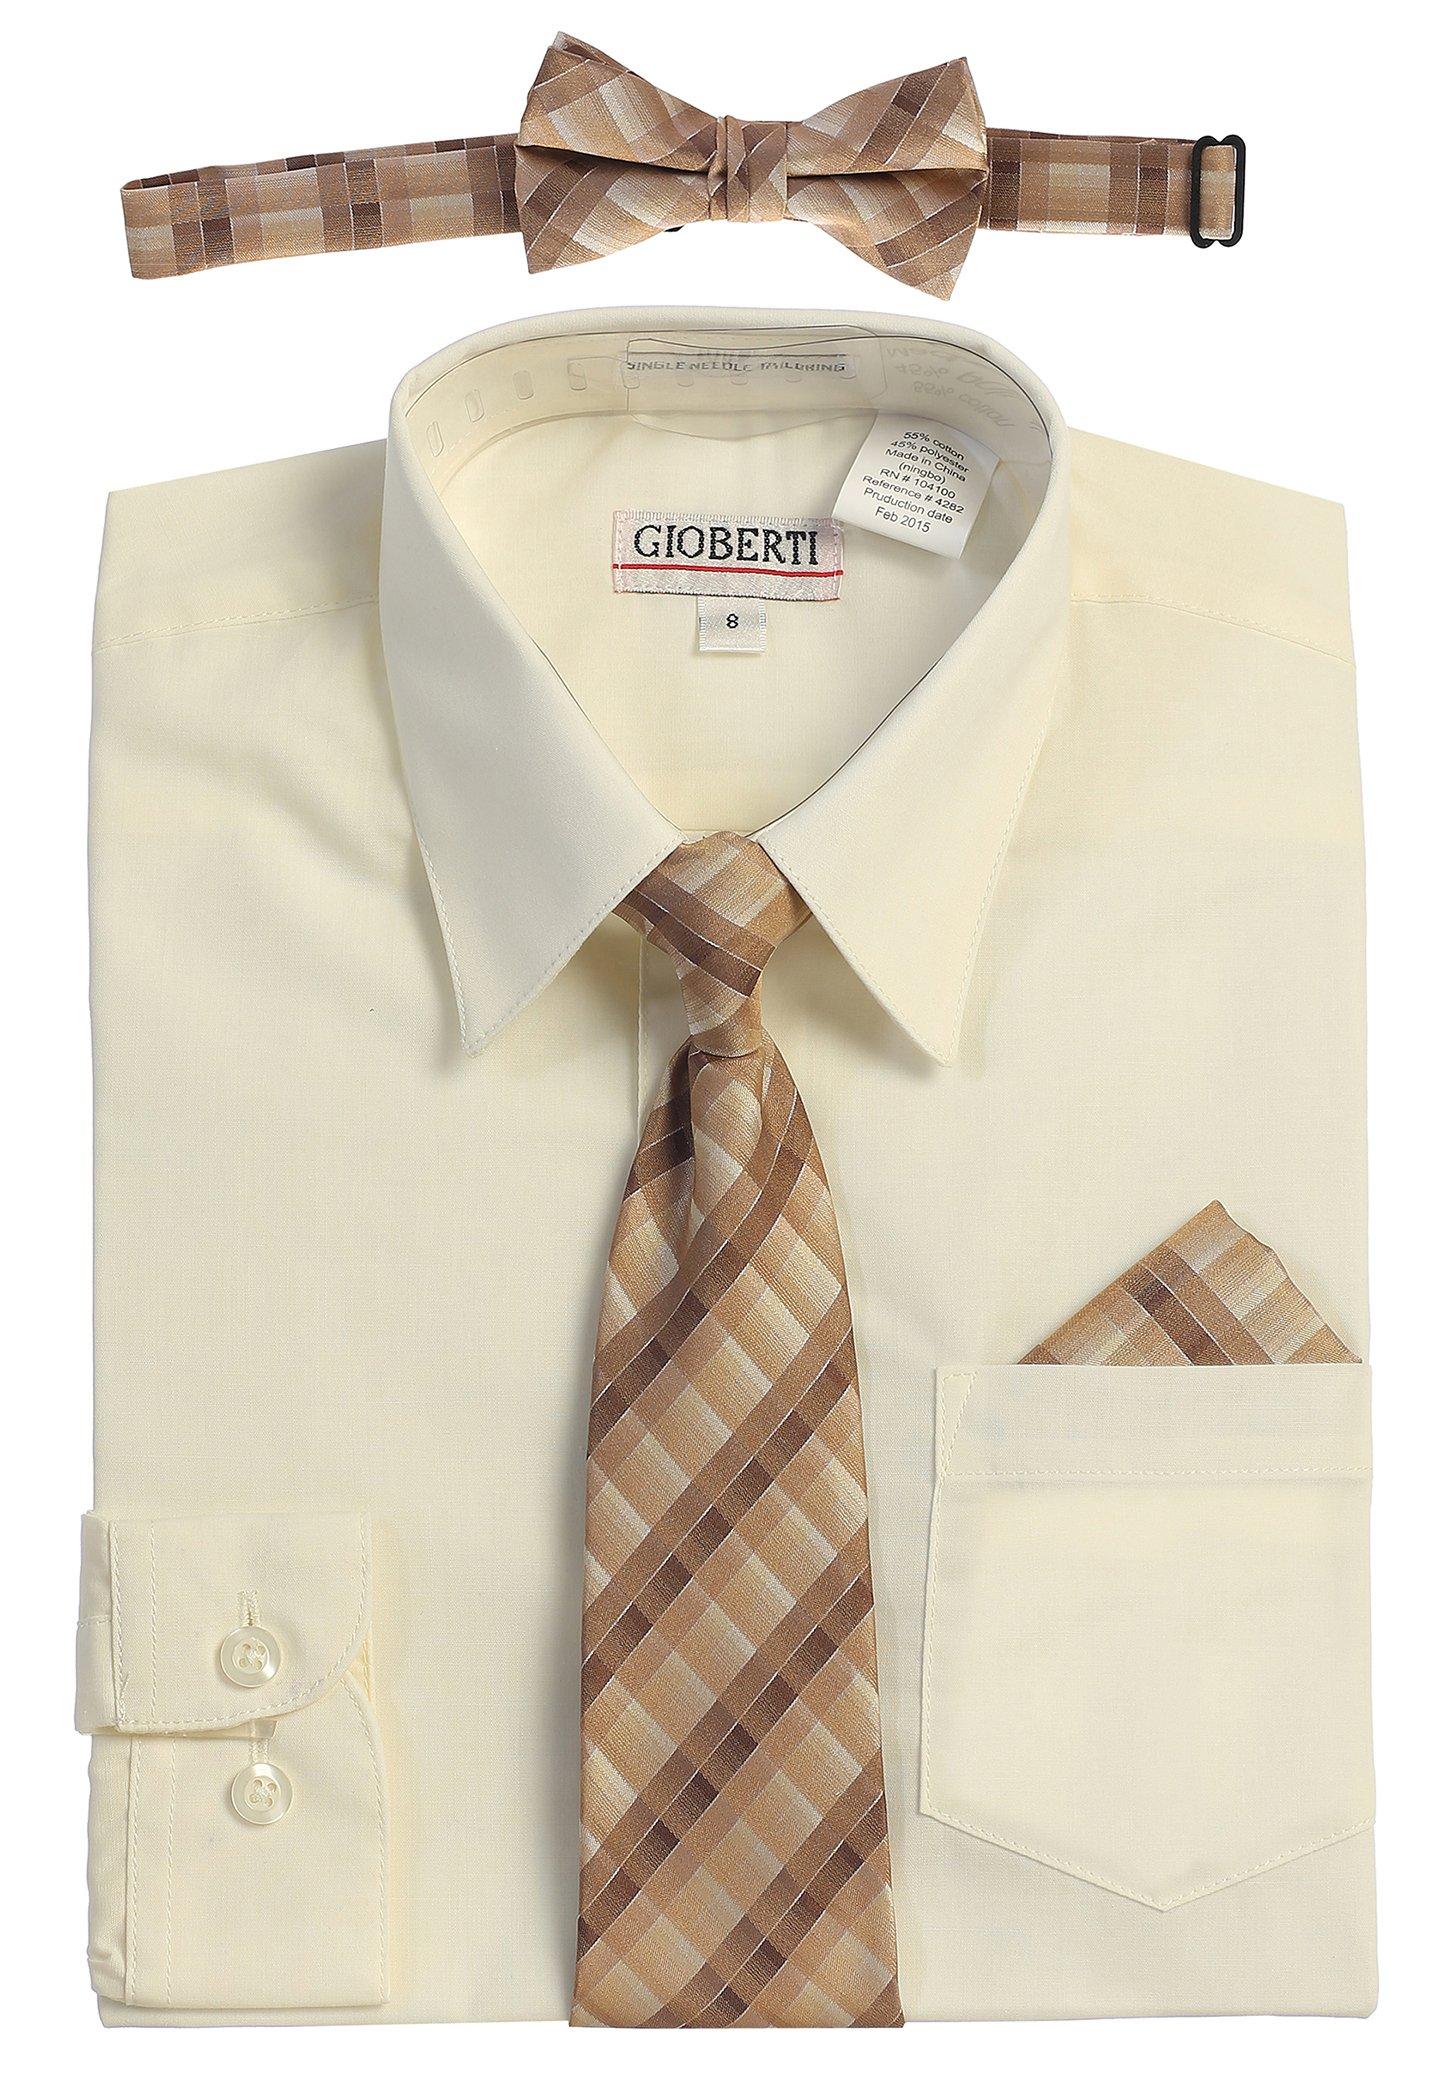 Gioberti Boy's Long Sleeve Dress Shirt and Plaid Tie Set, Ivory, Size 14